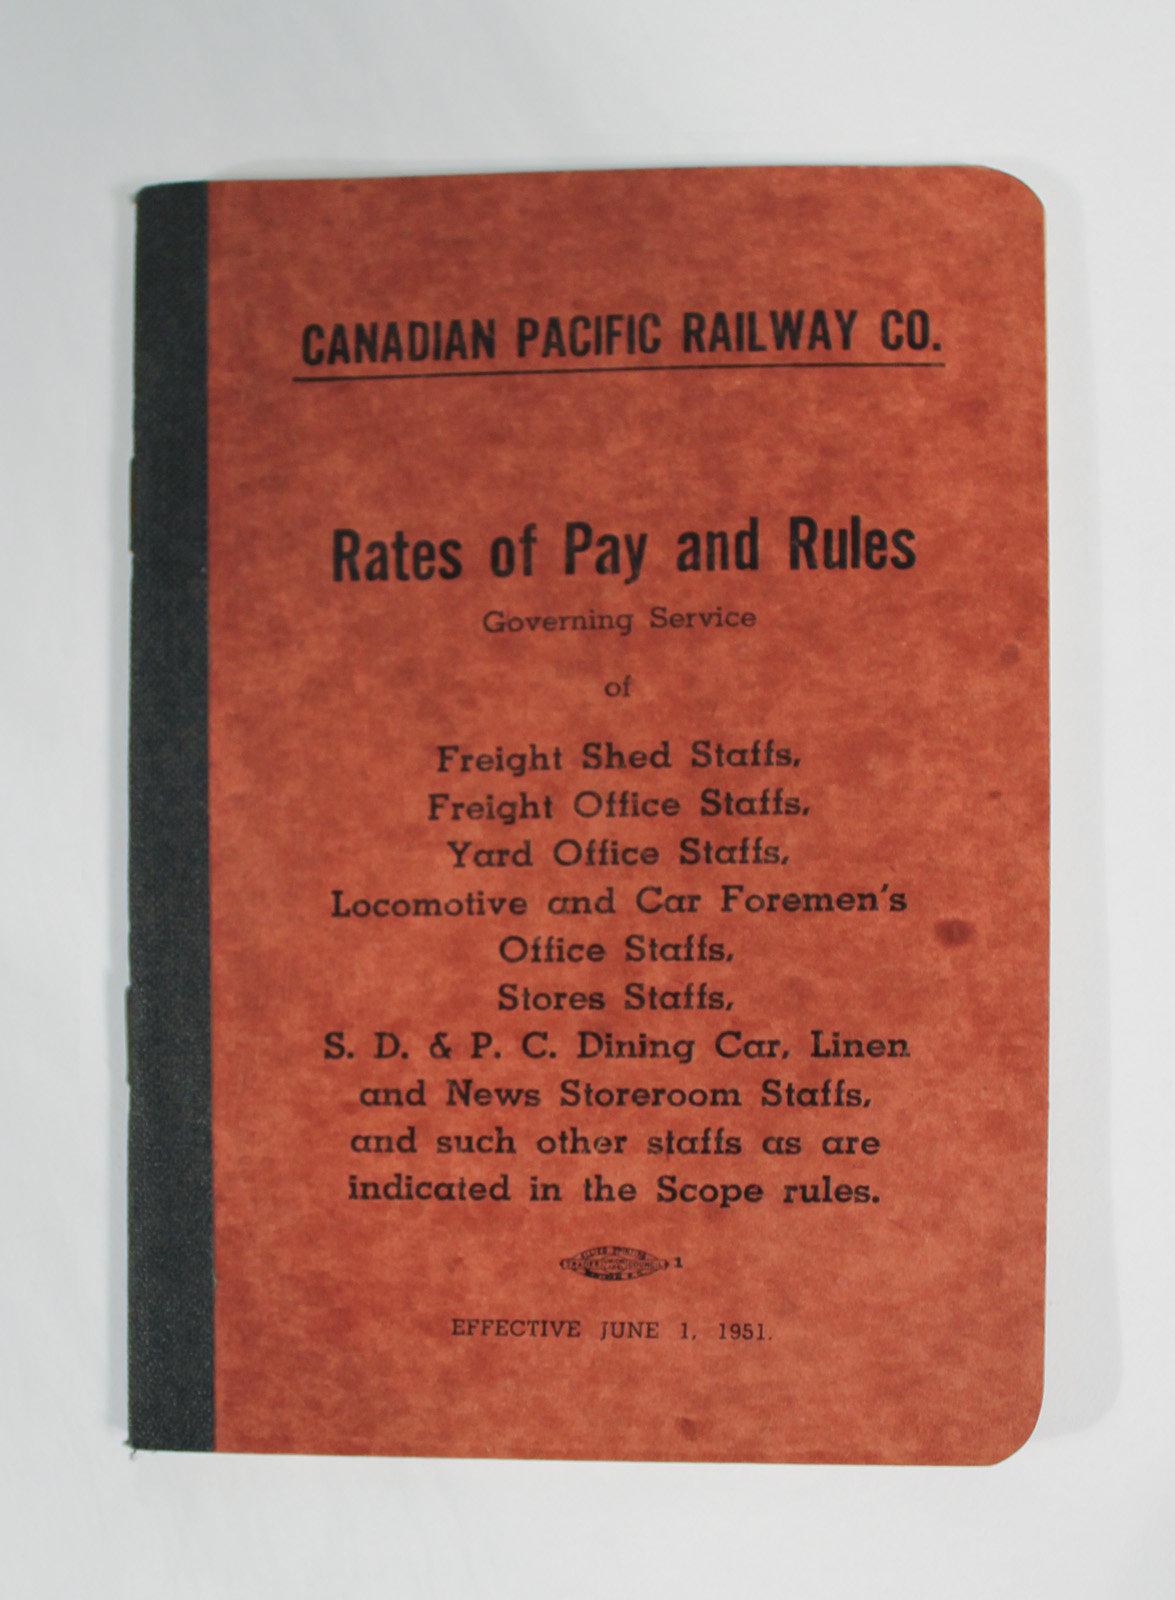 Canadian Pacific Railway Company Handbooks: The Gateway to ... Pacific Railway Company